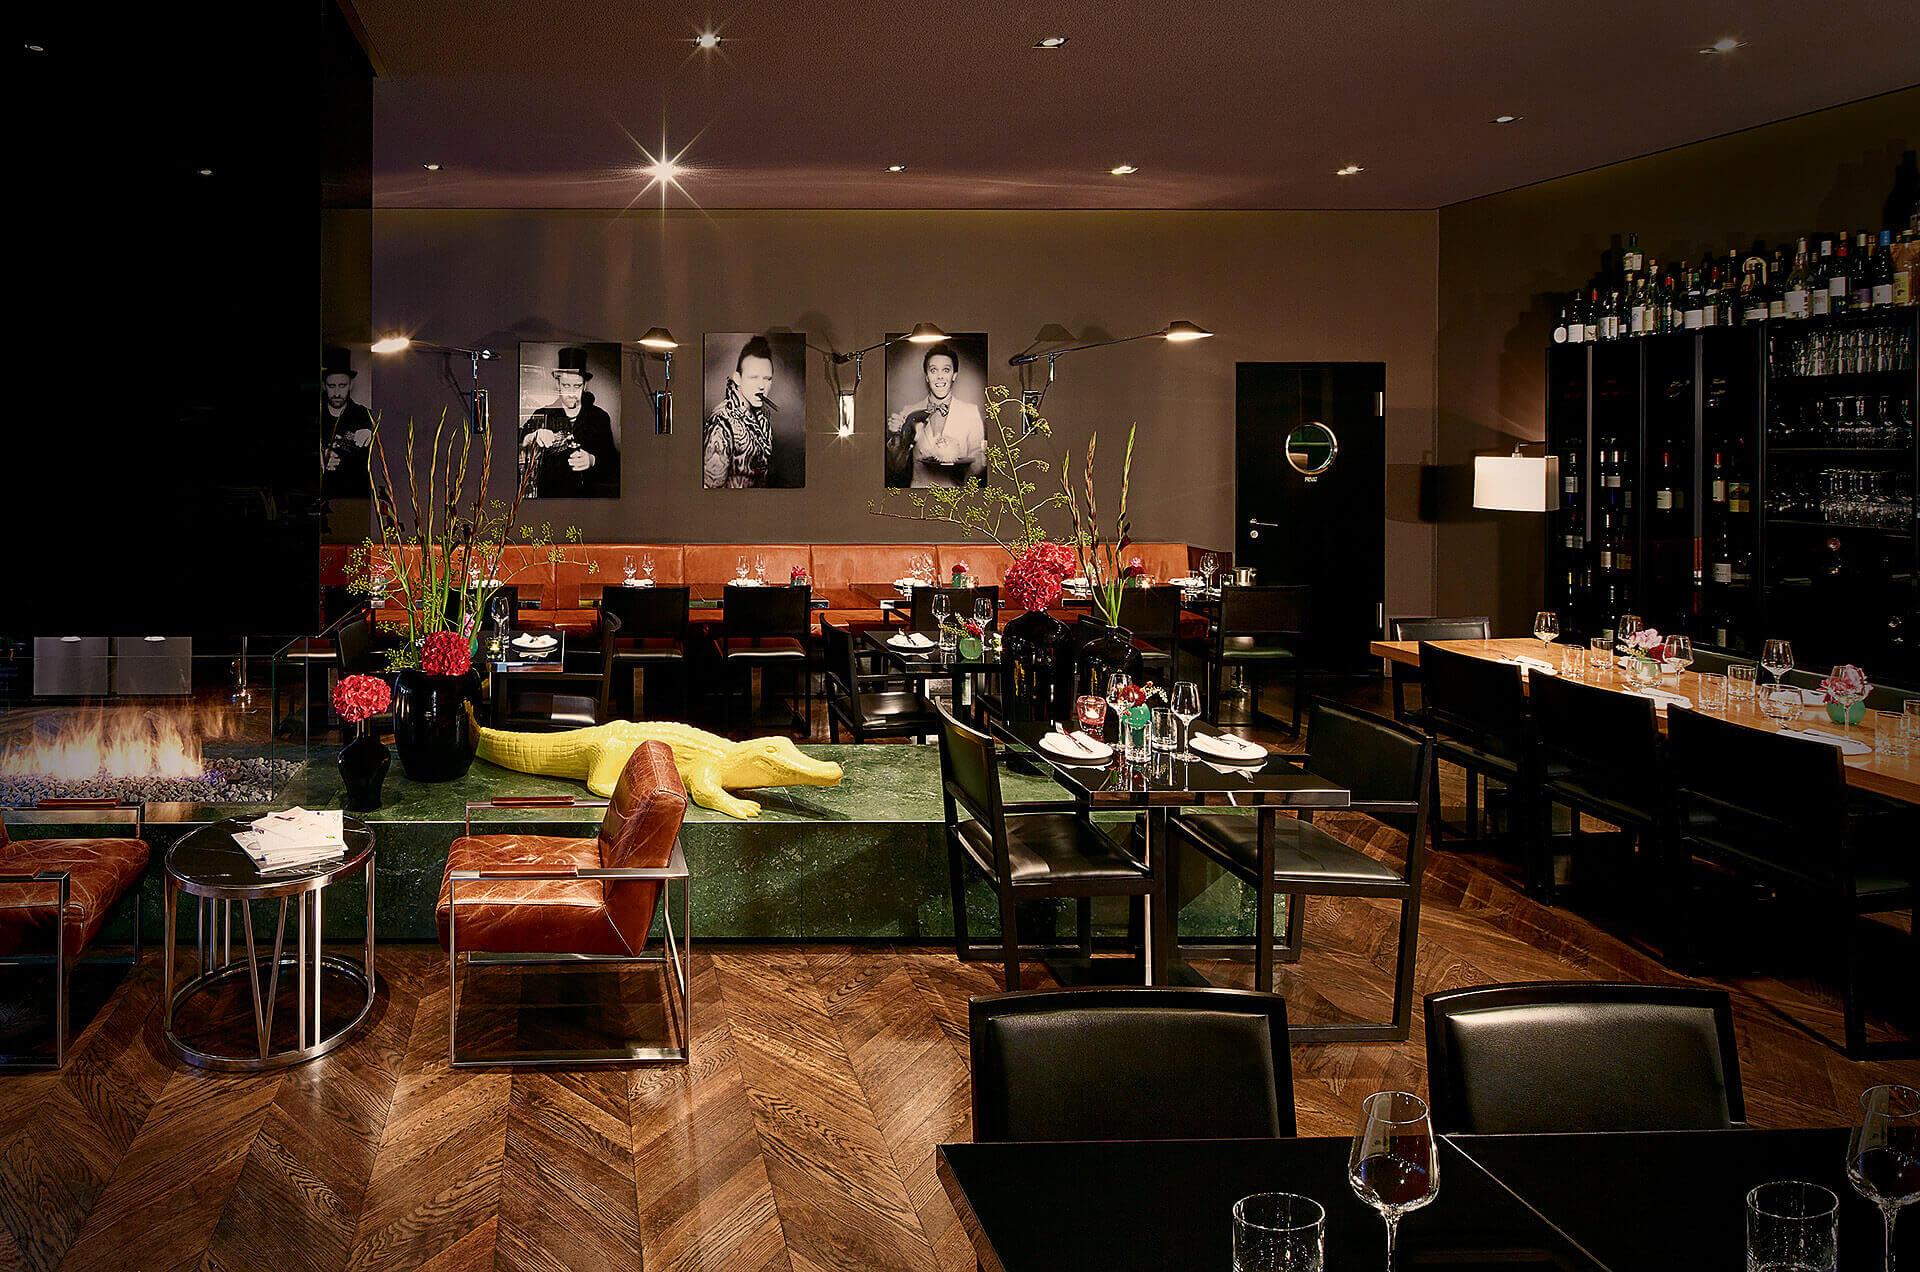 restaurant event location in berlin mitte mani restaurant. Black Bedroom Furniture Sets. Home Design Ideas